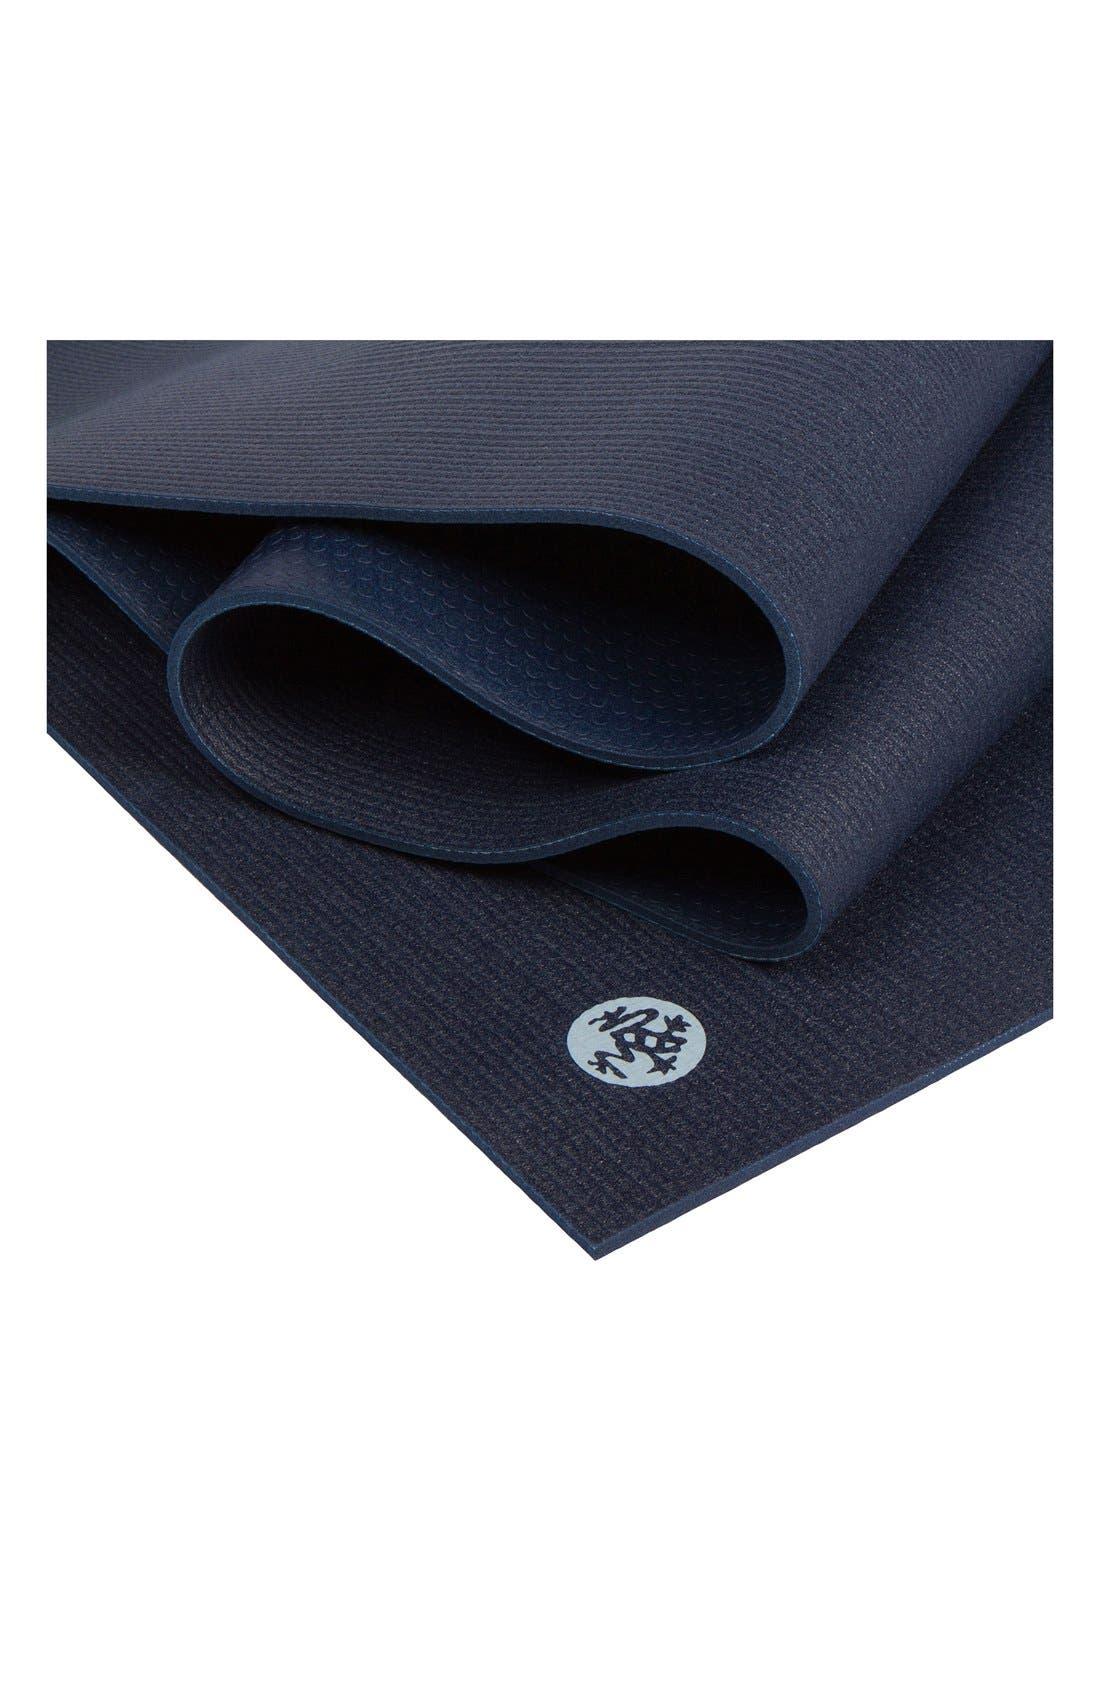 'ProLite' Yoga Mat,                             Alternate thumbnail 4, color,                             Midnight